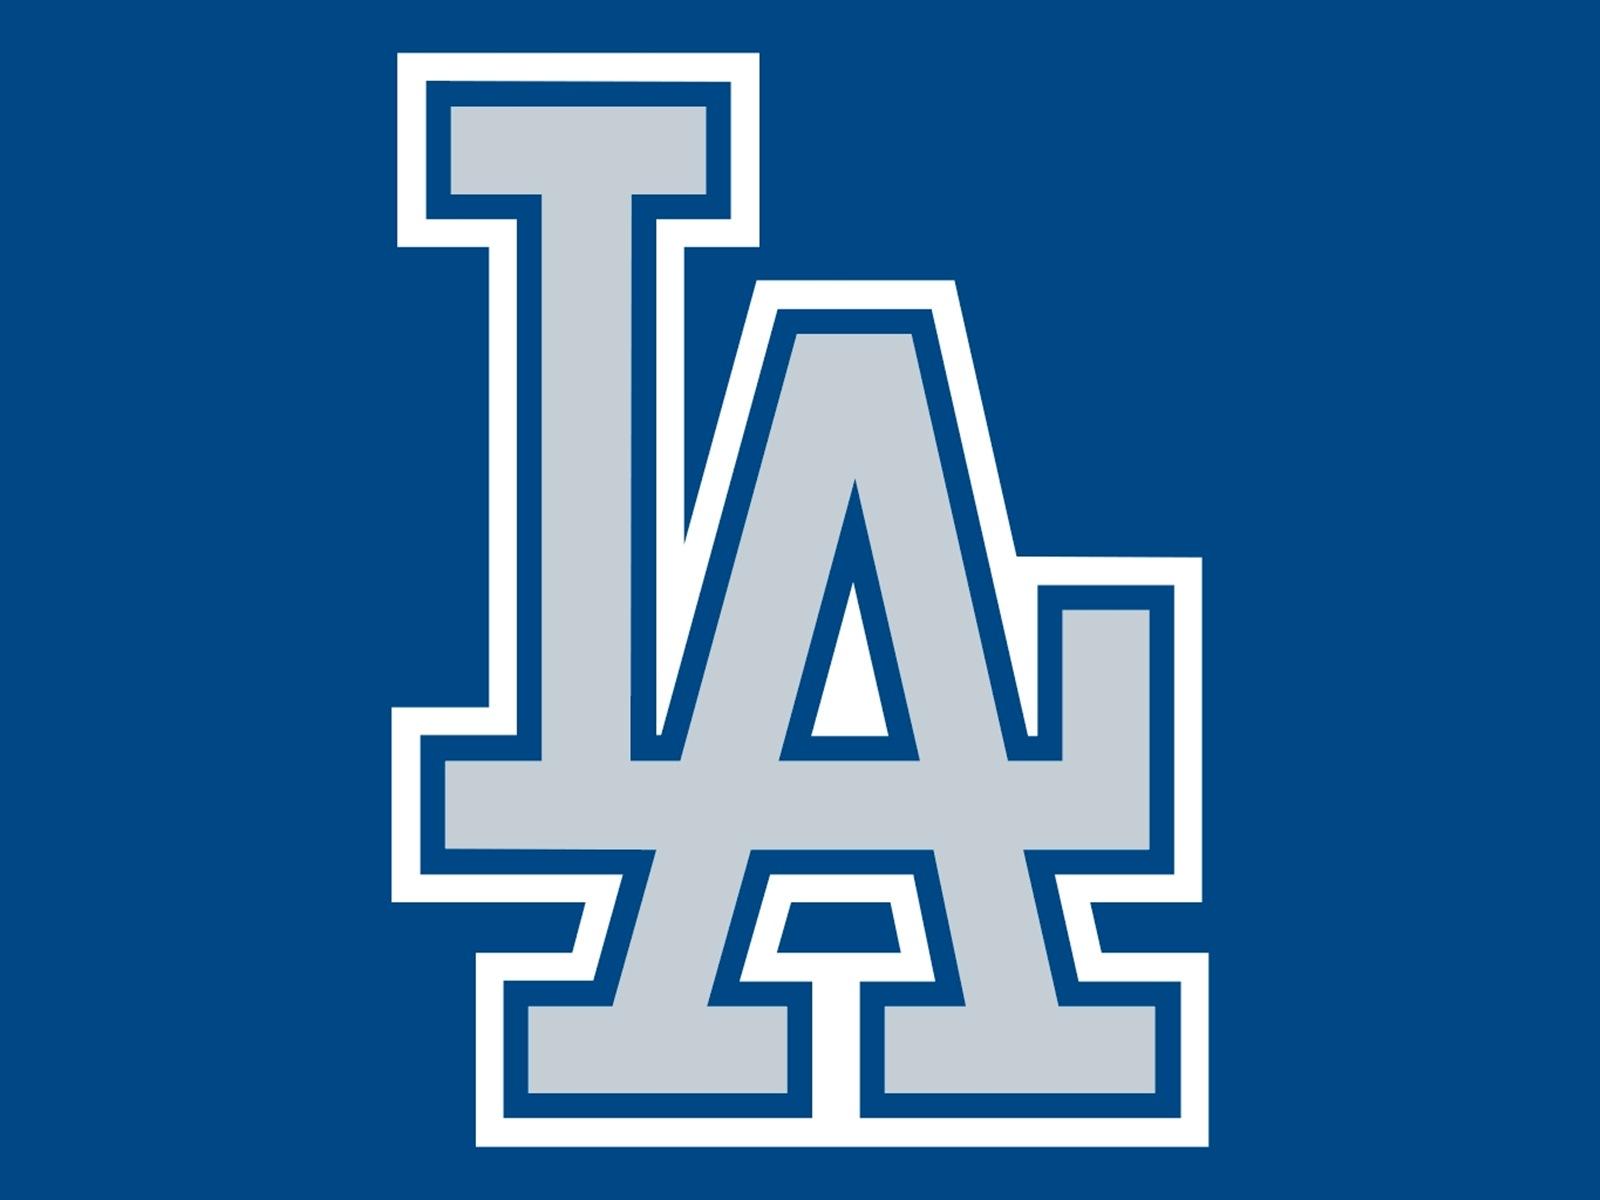 La logo Wallpaper